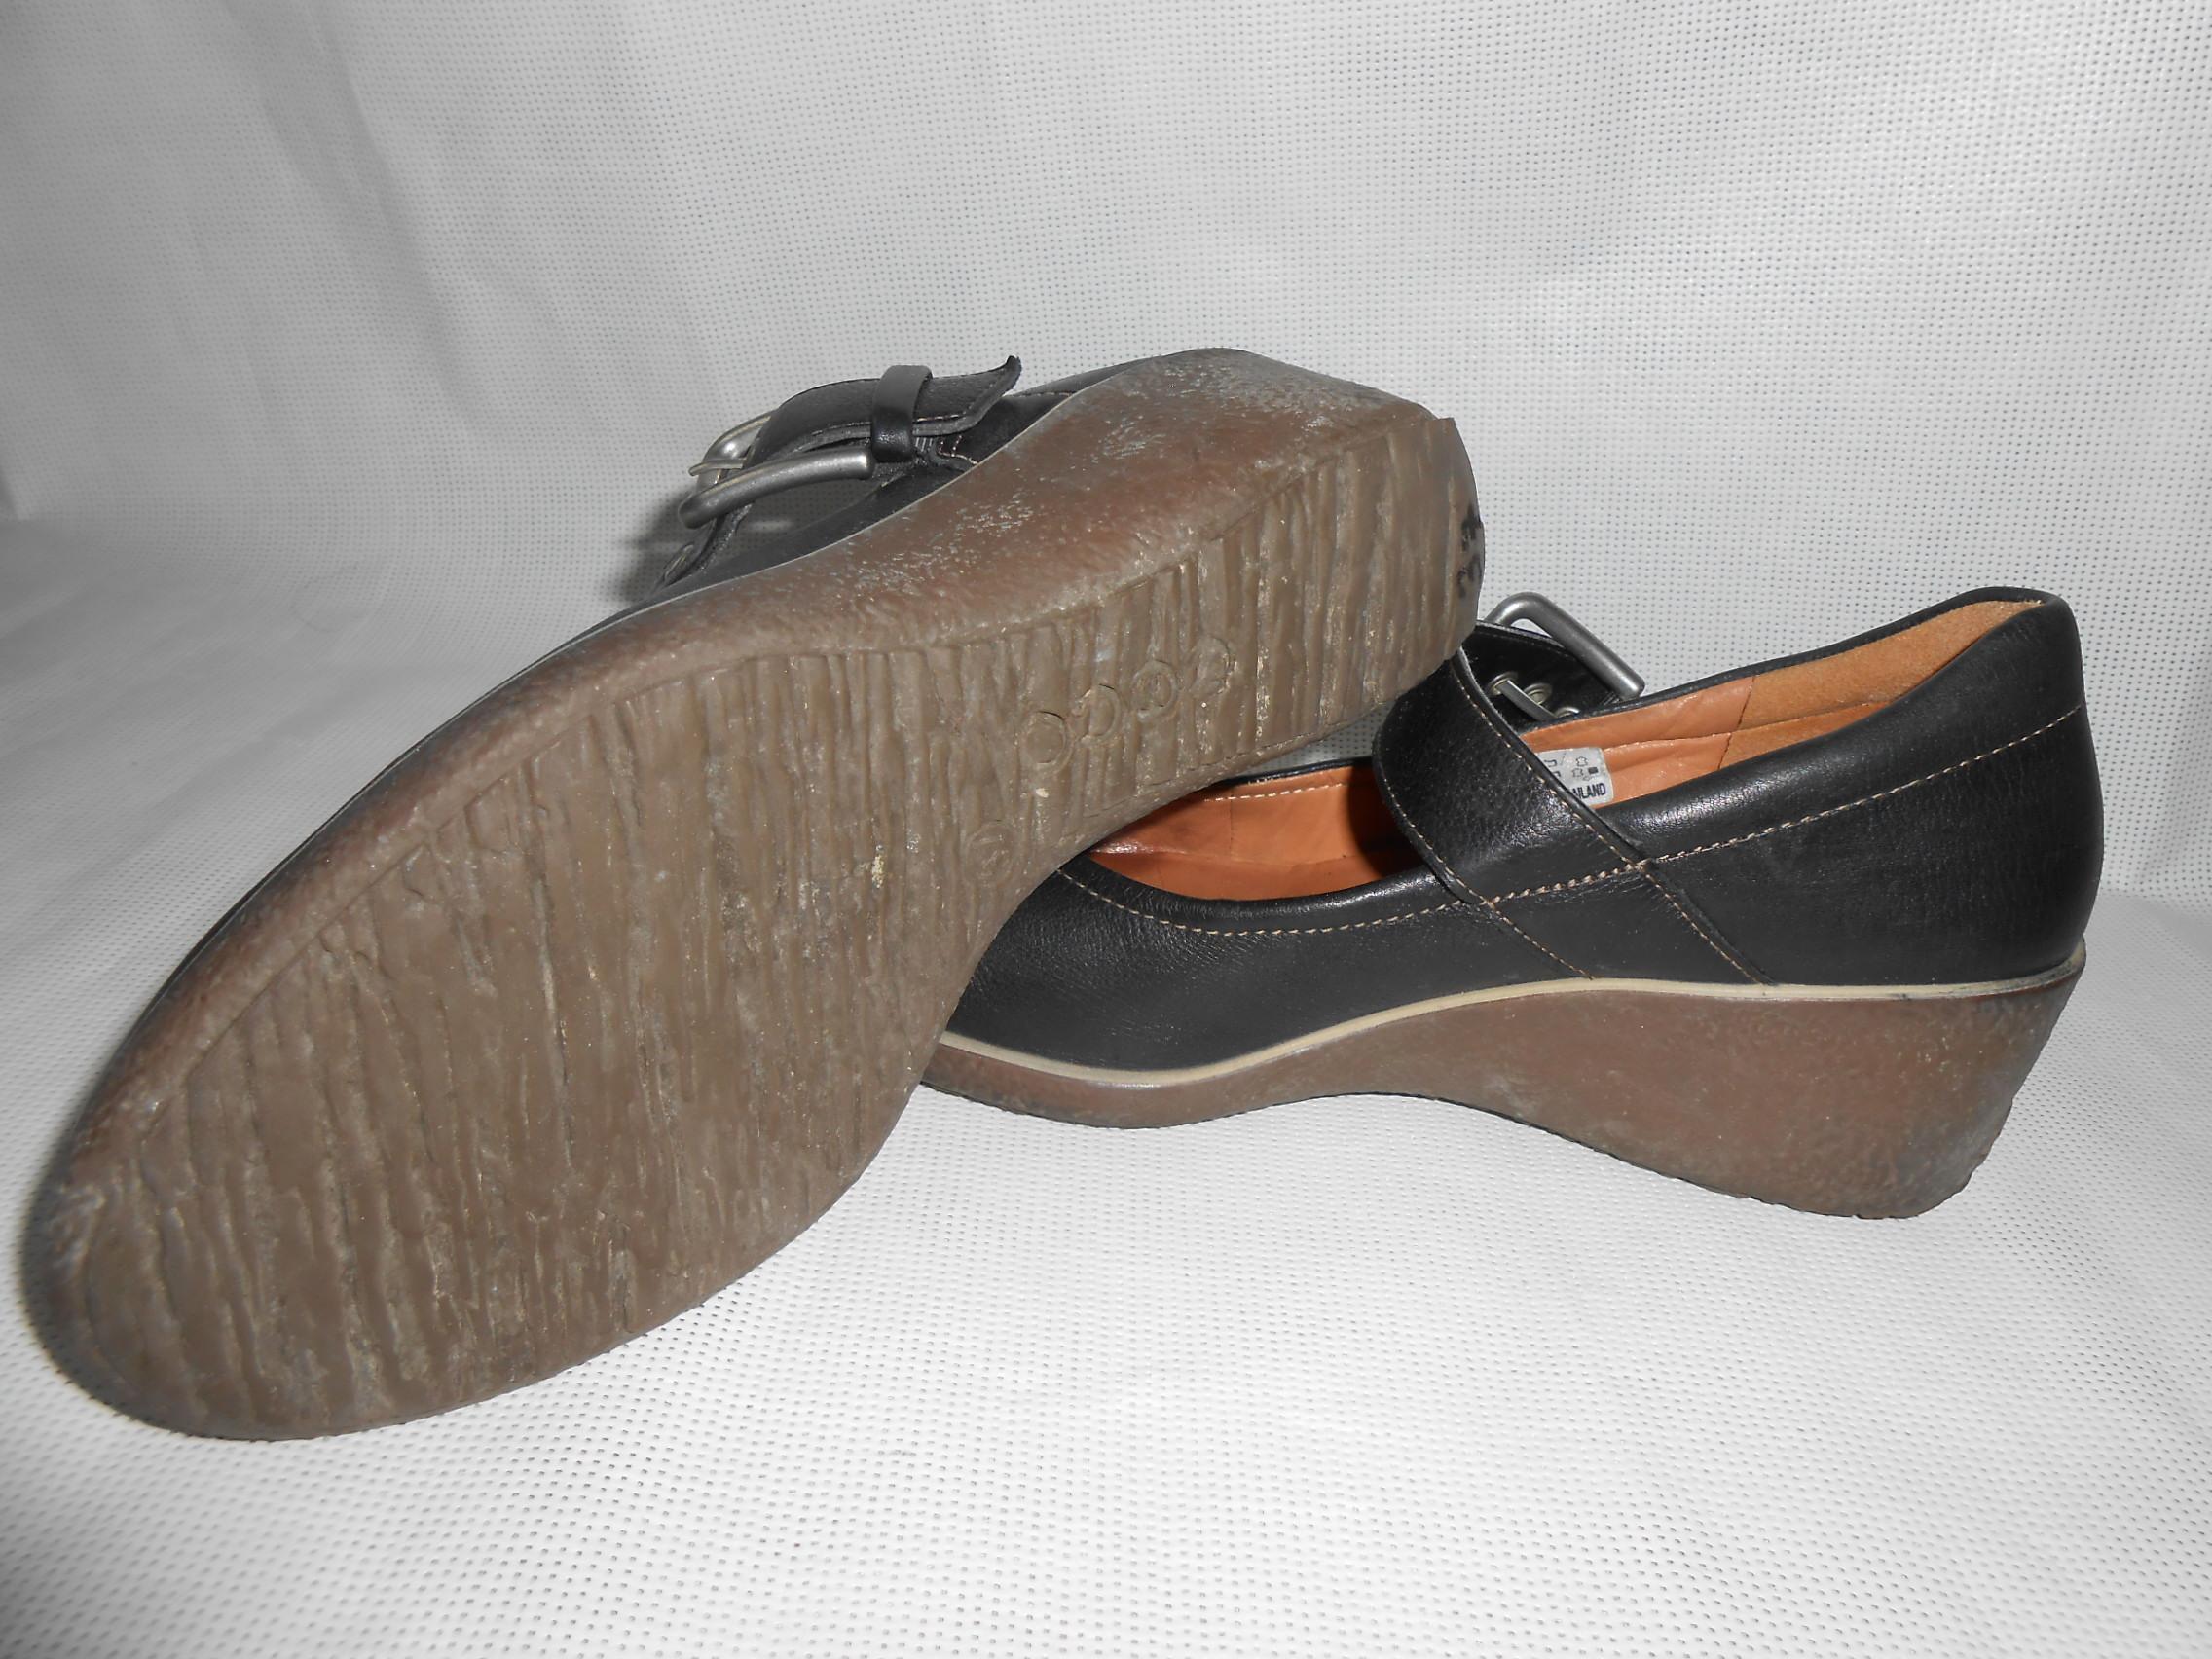 8d7f4109 ECCO Super buty damskie z Anglii !!nr 37 - 7388461364 - oficjalne ...